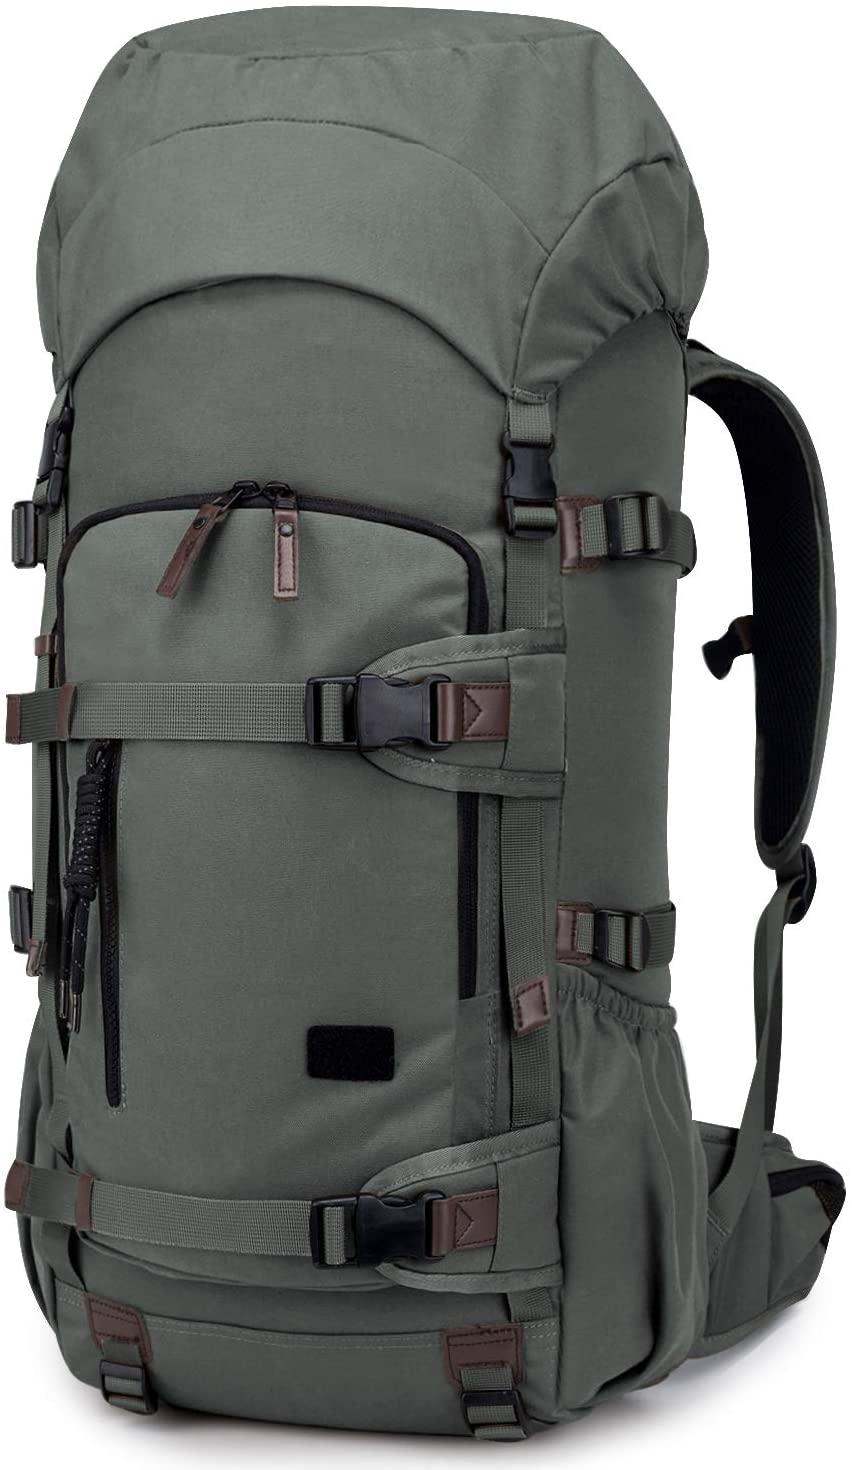 TAK 50L/60L Tactical Backpack Military Backpack Internal Frame for Camping Hiking Trekking